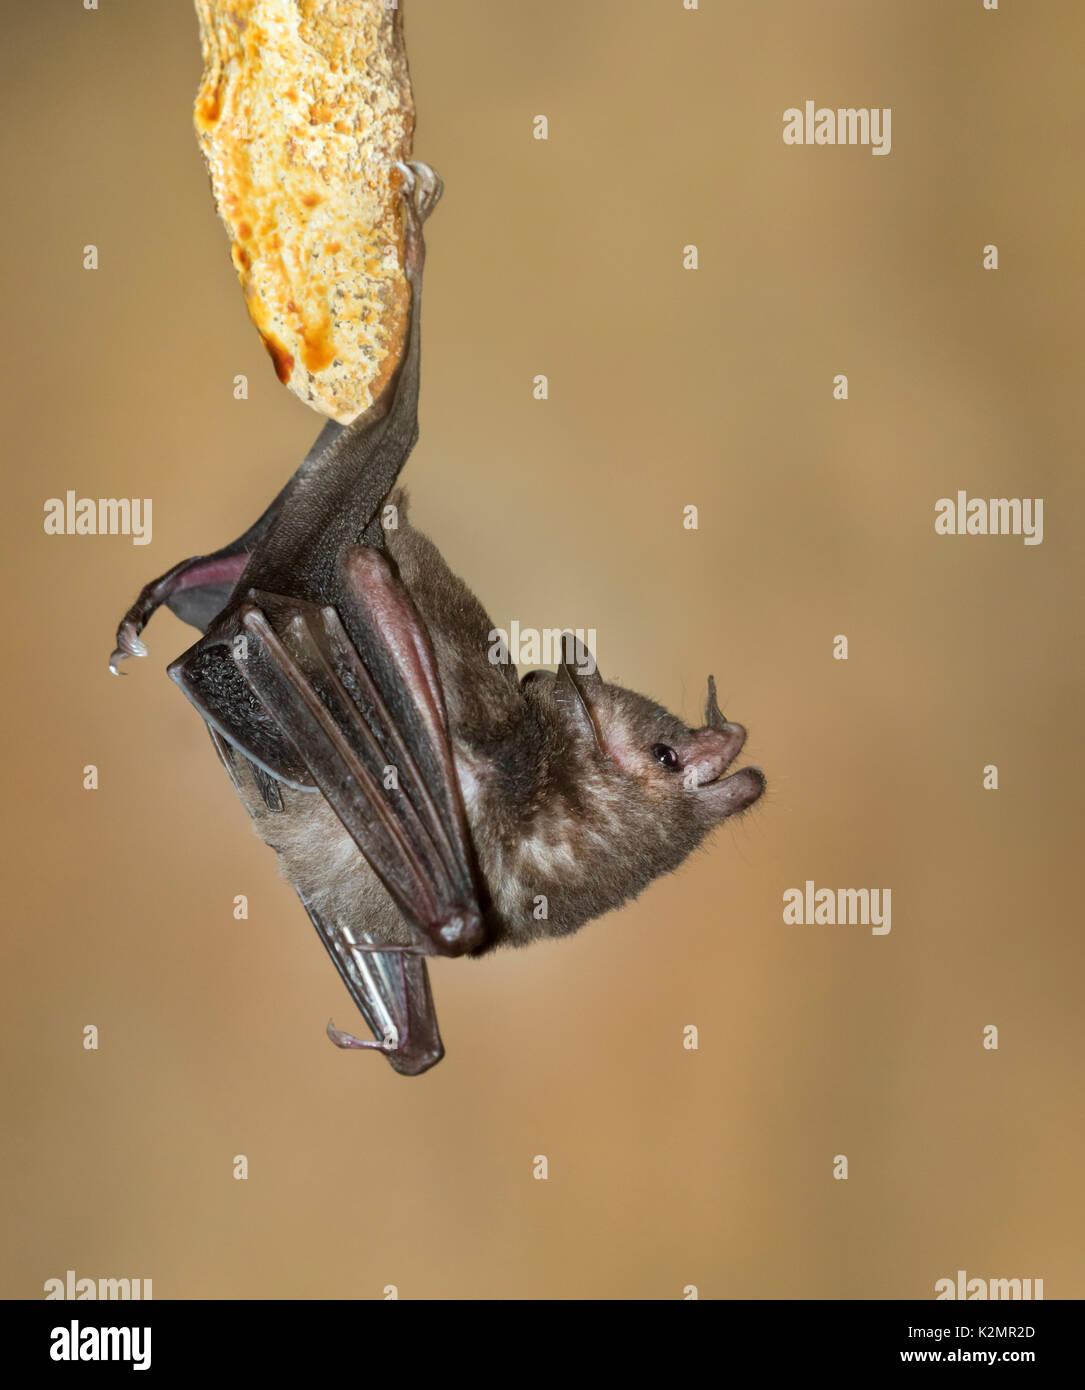 Seba's Short-tailed Bat (Carollia perspicillata) - Stock Image